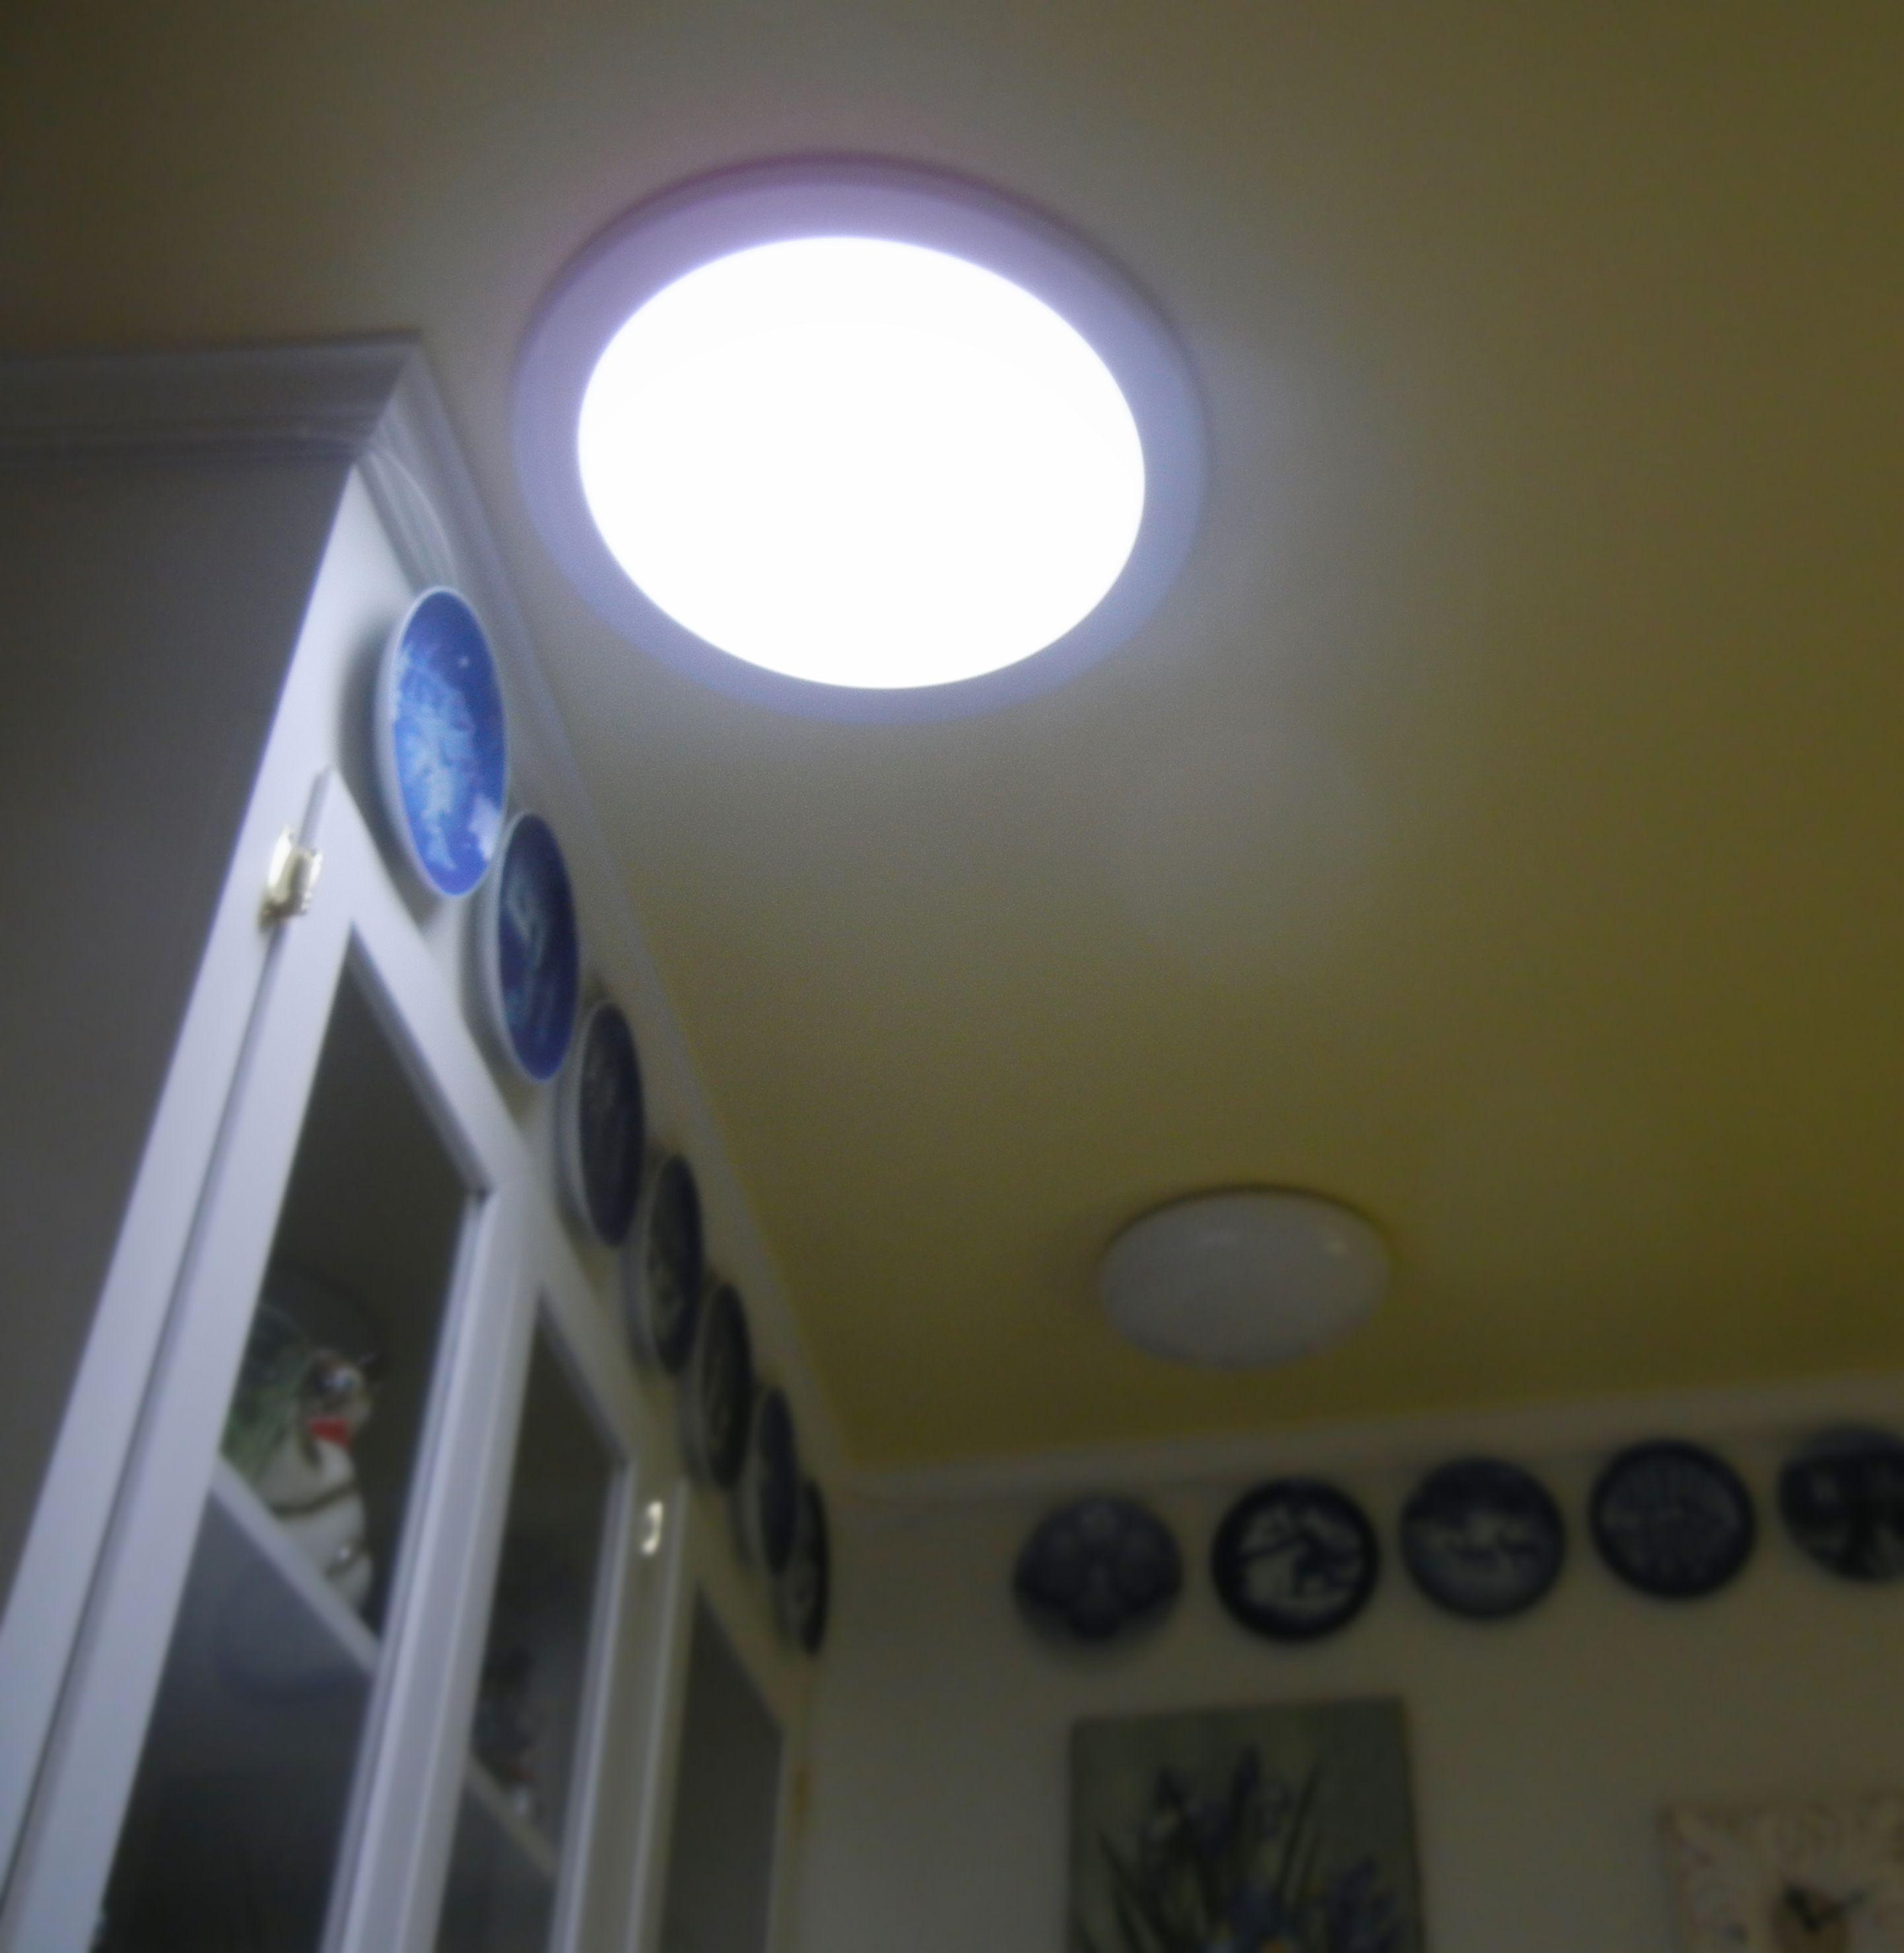 Solar Tube Light In The Kitchen Image To Show Effect Of The Solar Tube Solar Tube Lighting Bright Kitchens Tube Light